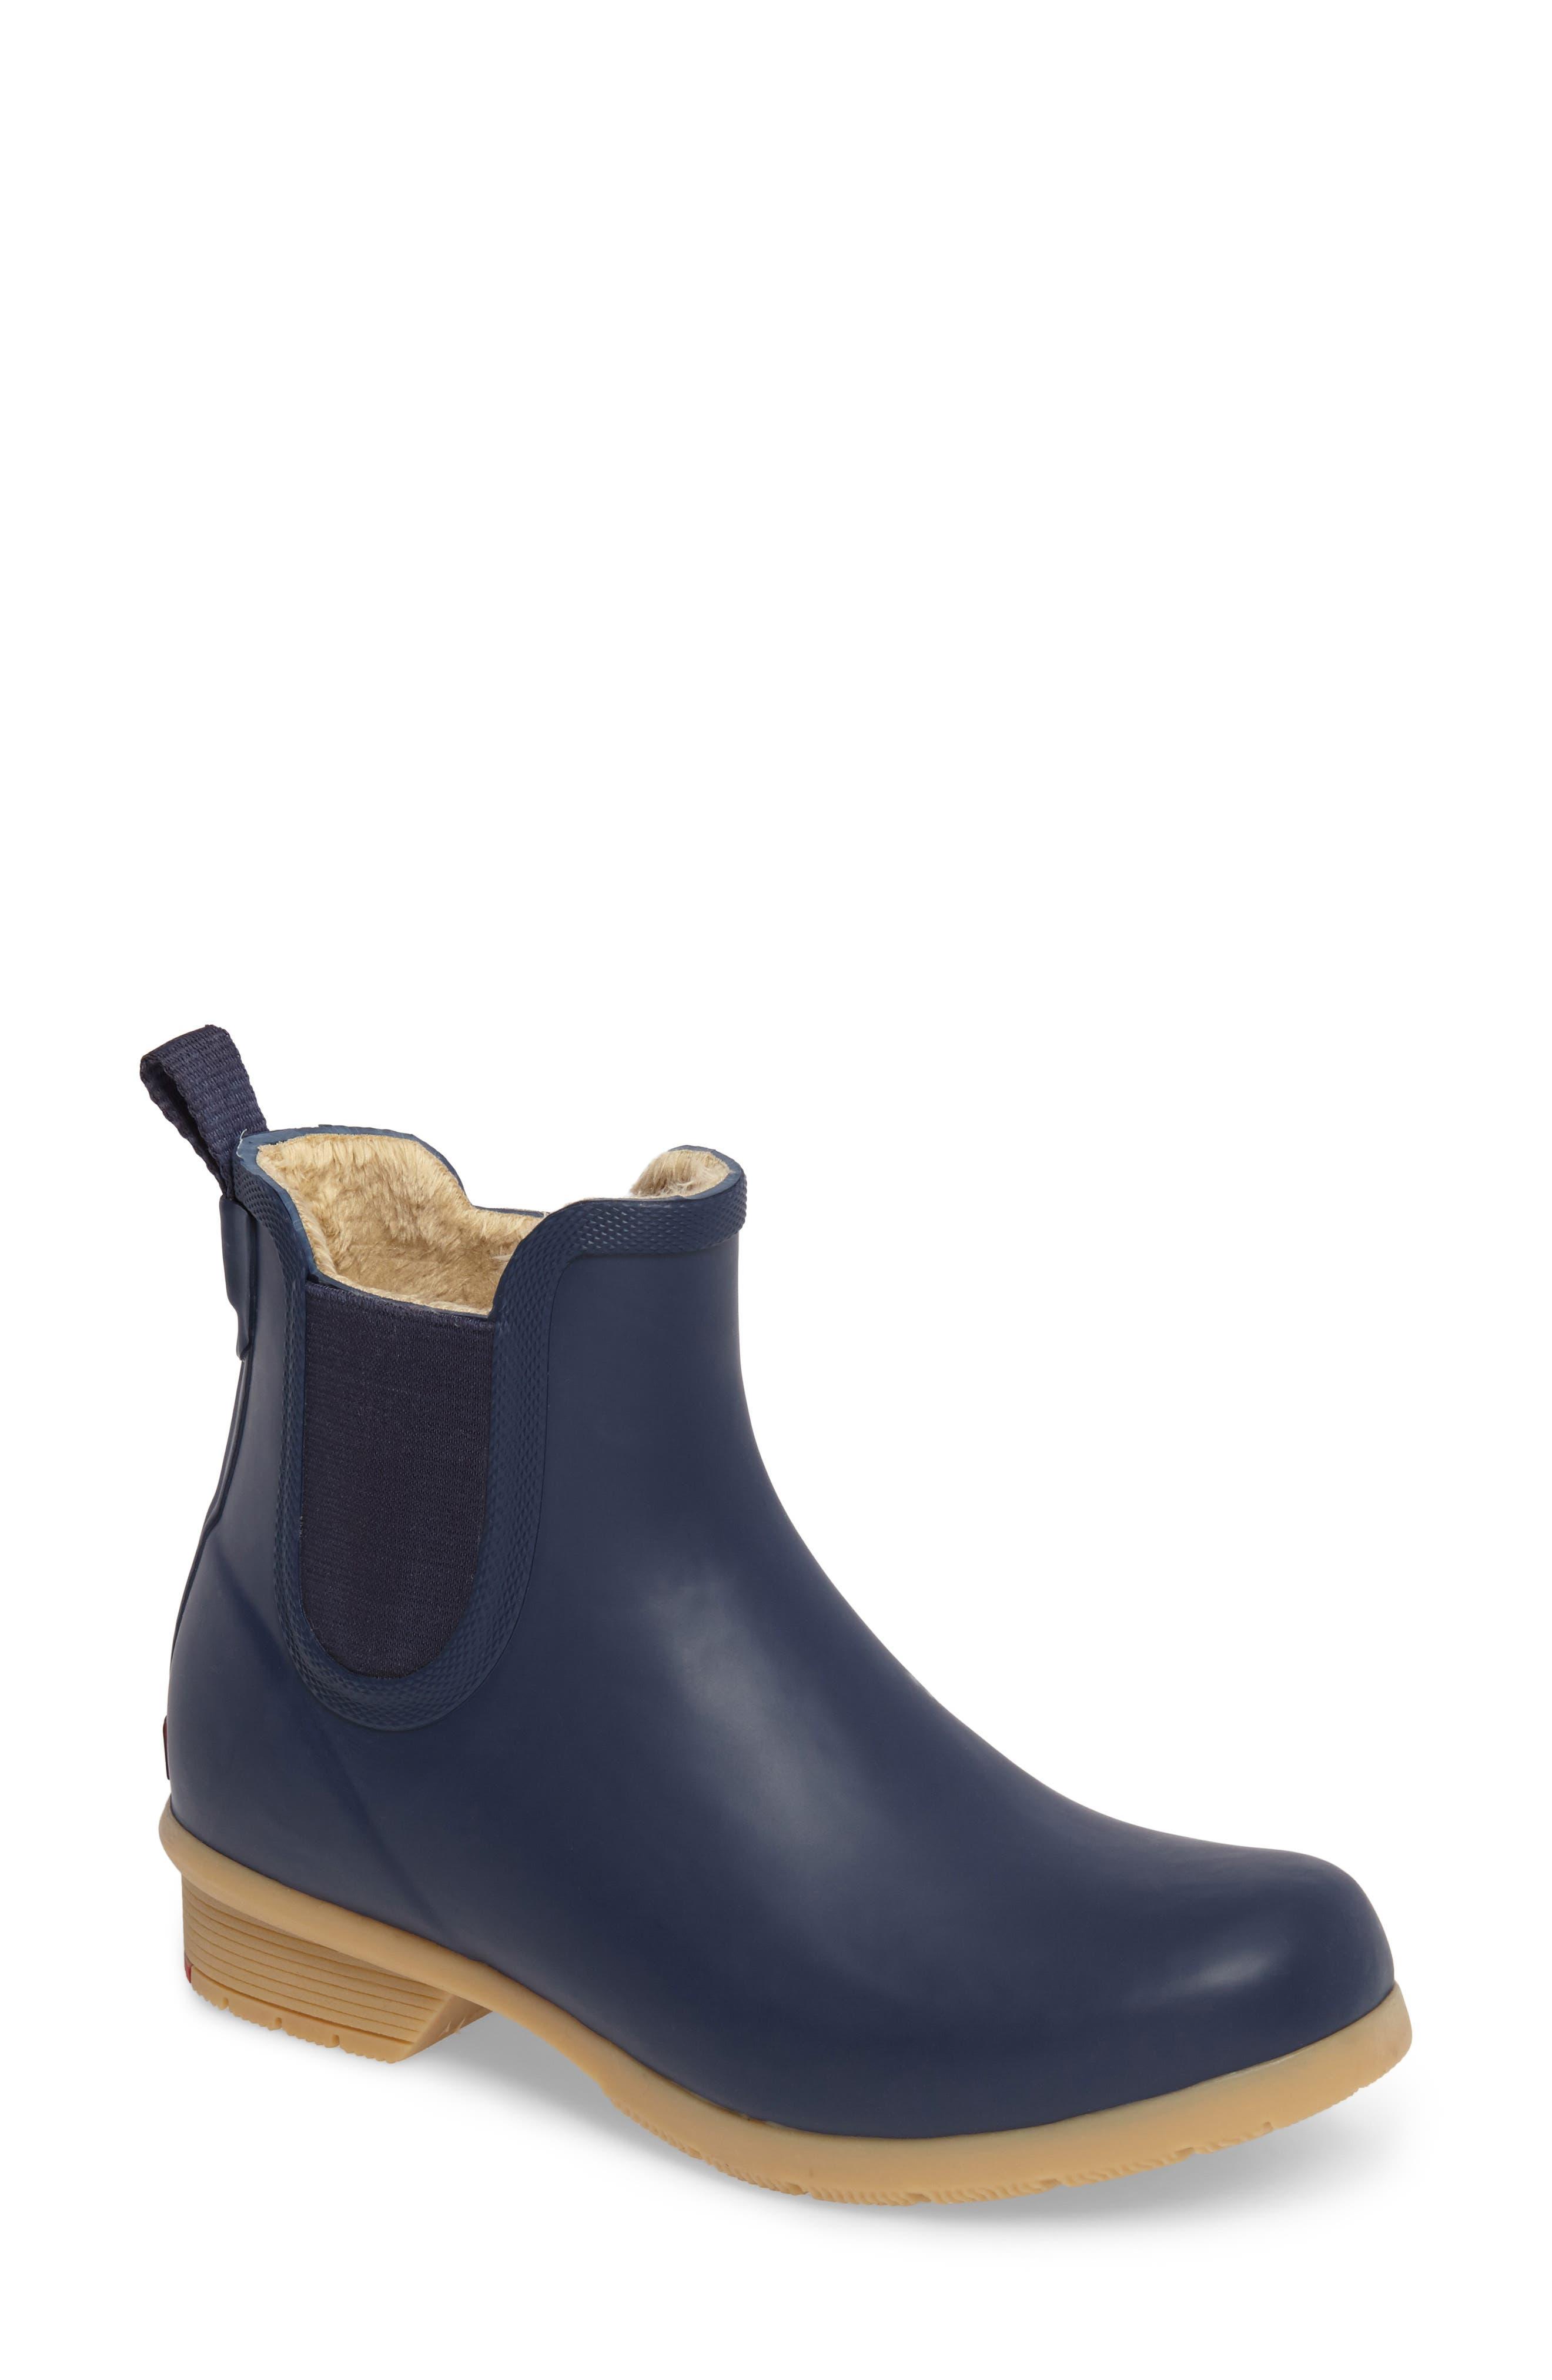 Chooka Bainbridge Chelsea Rain Boot, Blue